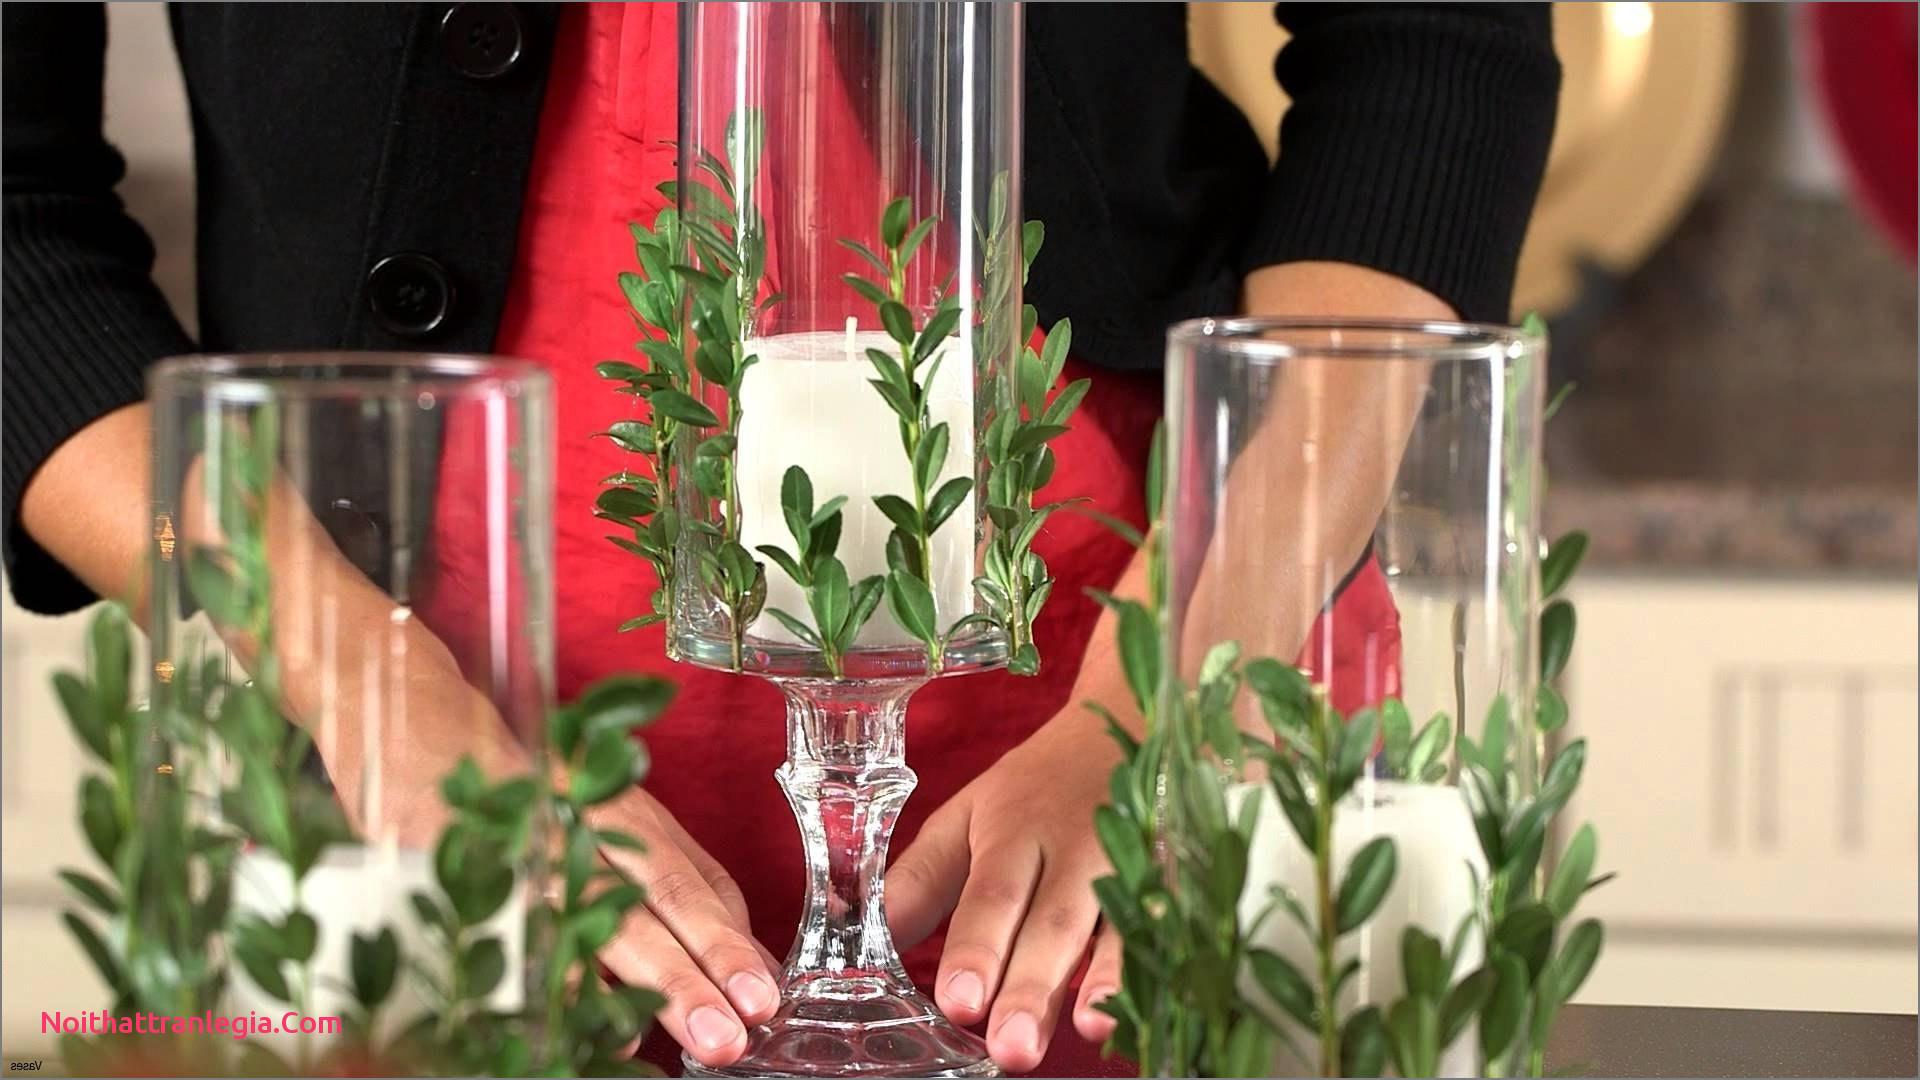 miniature glass vases wholesale of 20 wedding vases noithattranlegia vases design with regard to wedding centerpiece decoration ideas unique dollar tree wedding decorations awesome h vases dollar vase i 0d